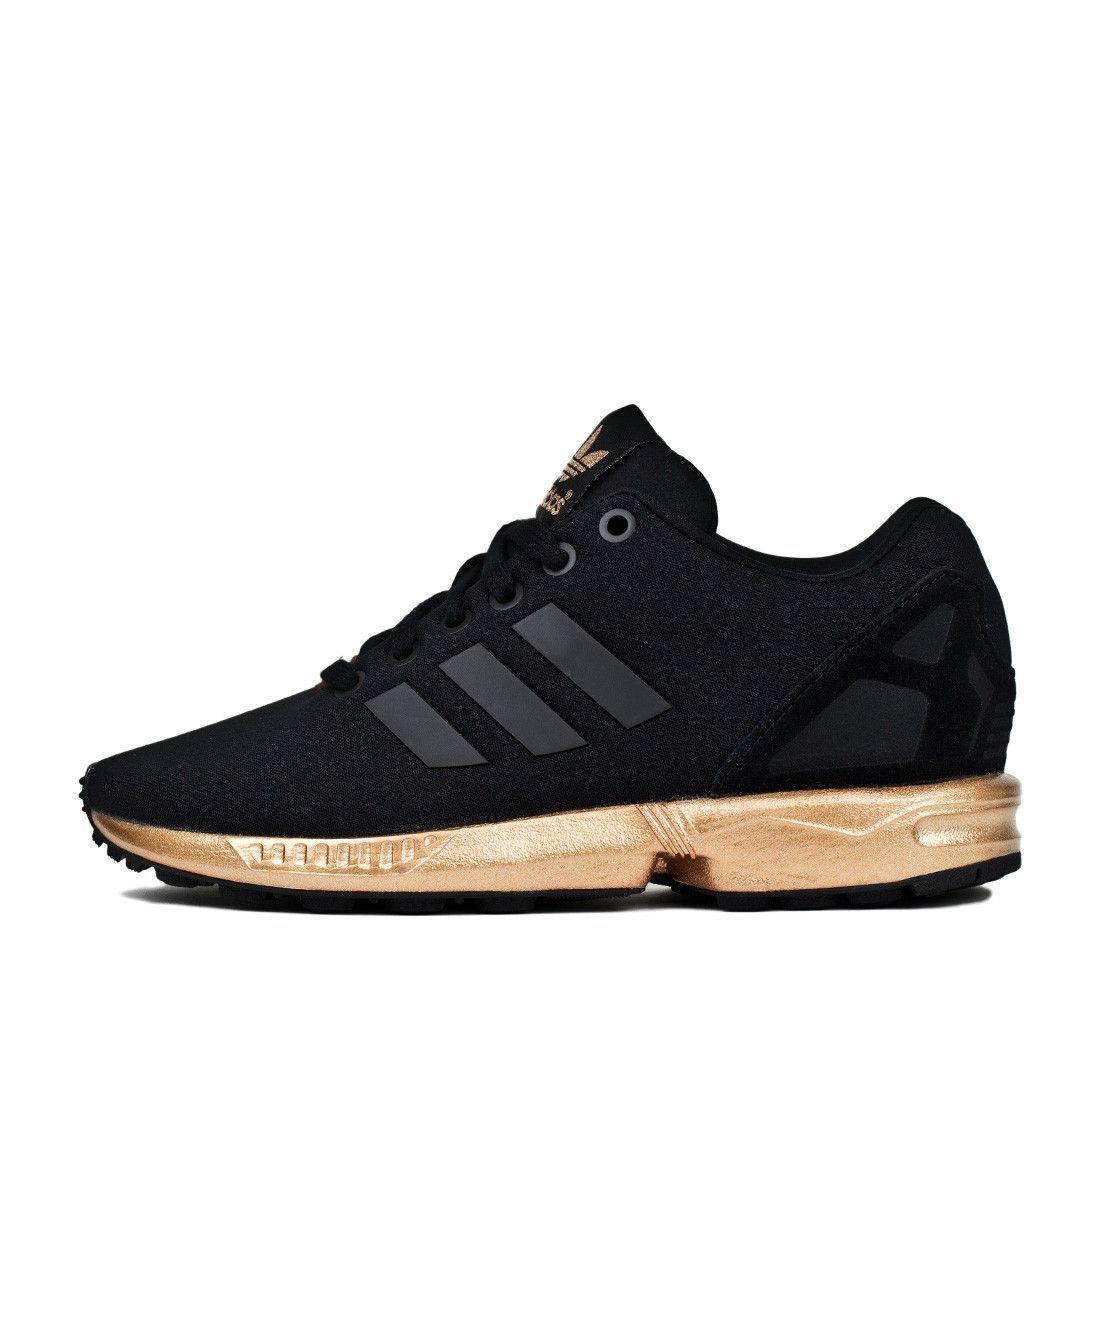 73b080a92abf4 ... purchase s78977 core black black adidas women womens womens zx 17faf  5ef60 norway adidas zx flux ...